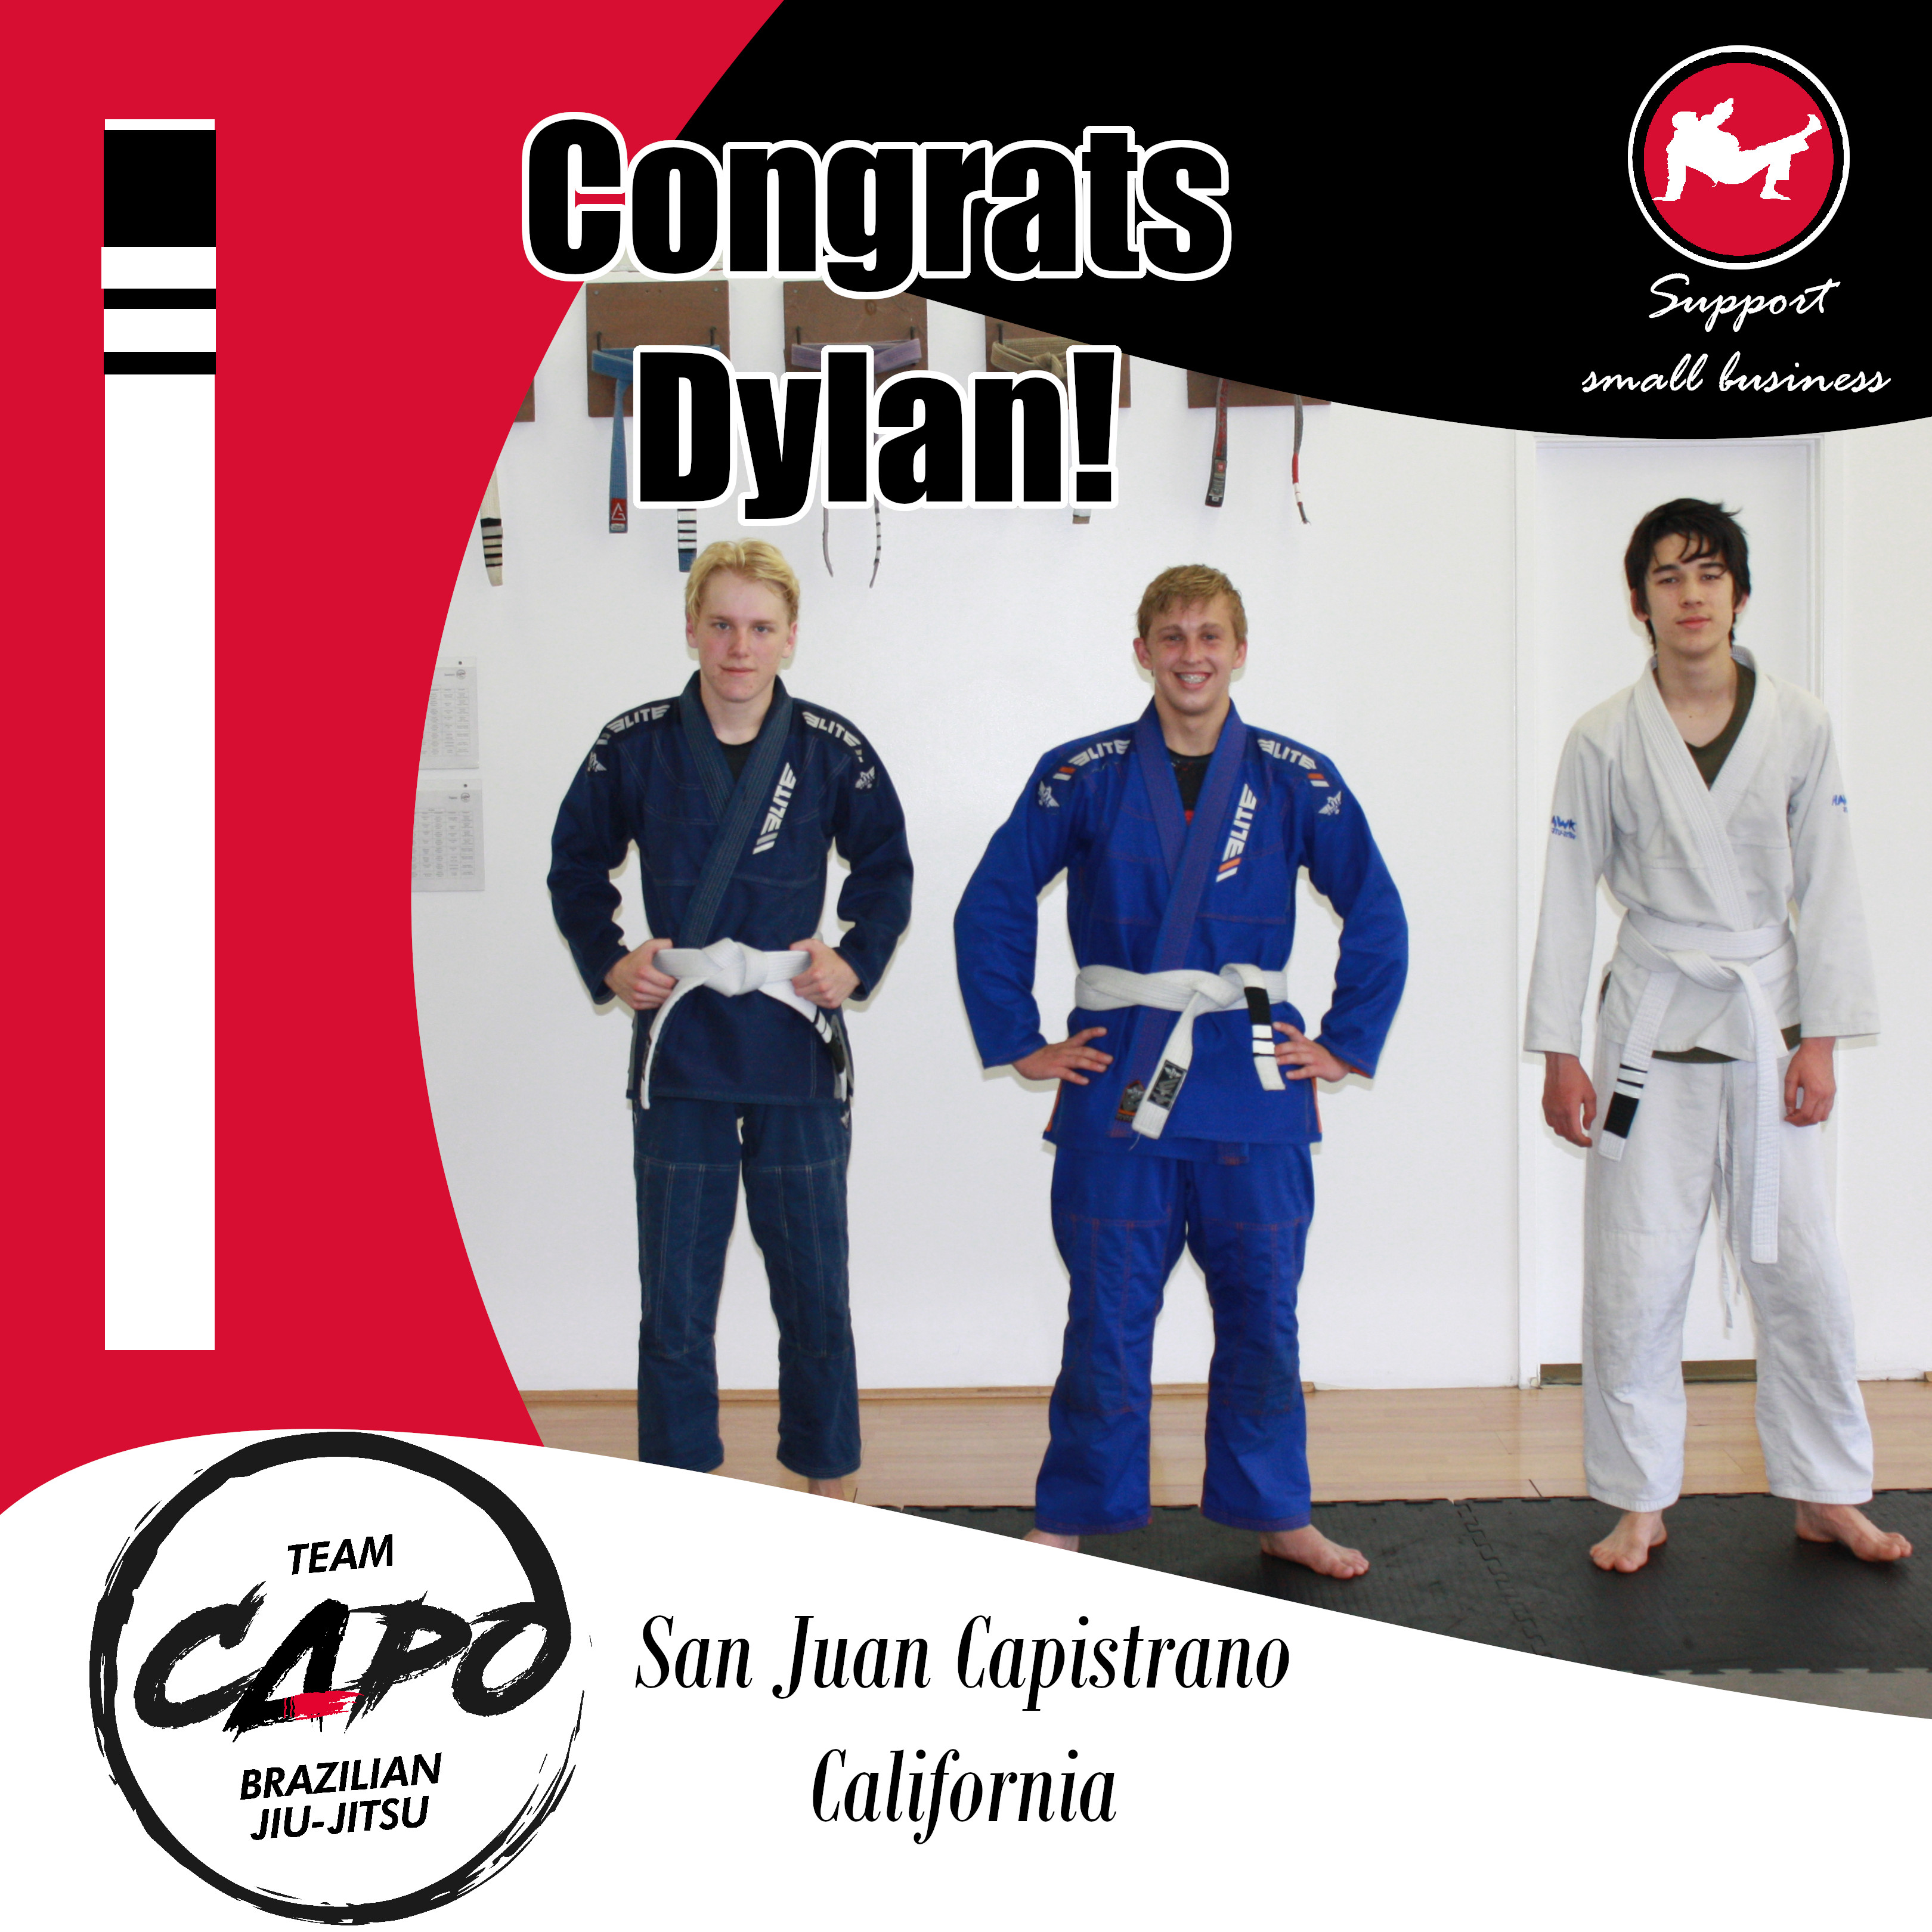 Congrats Dylan!